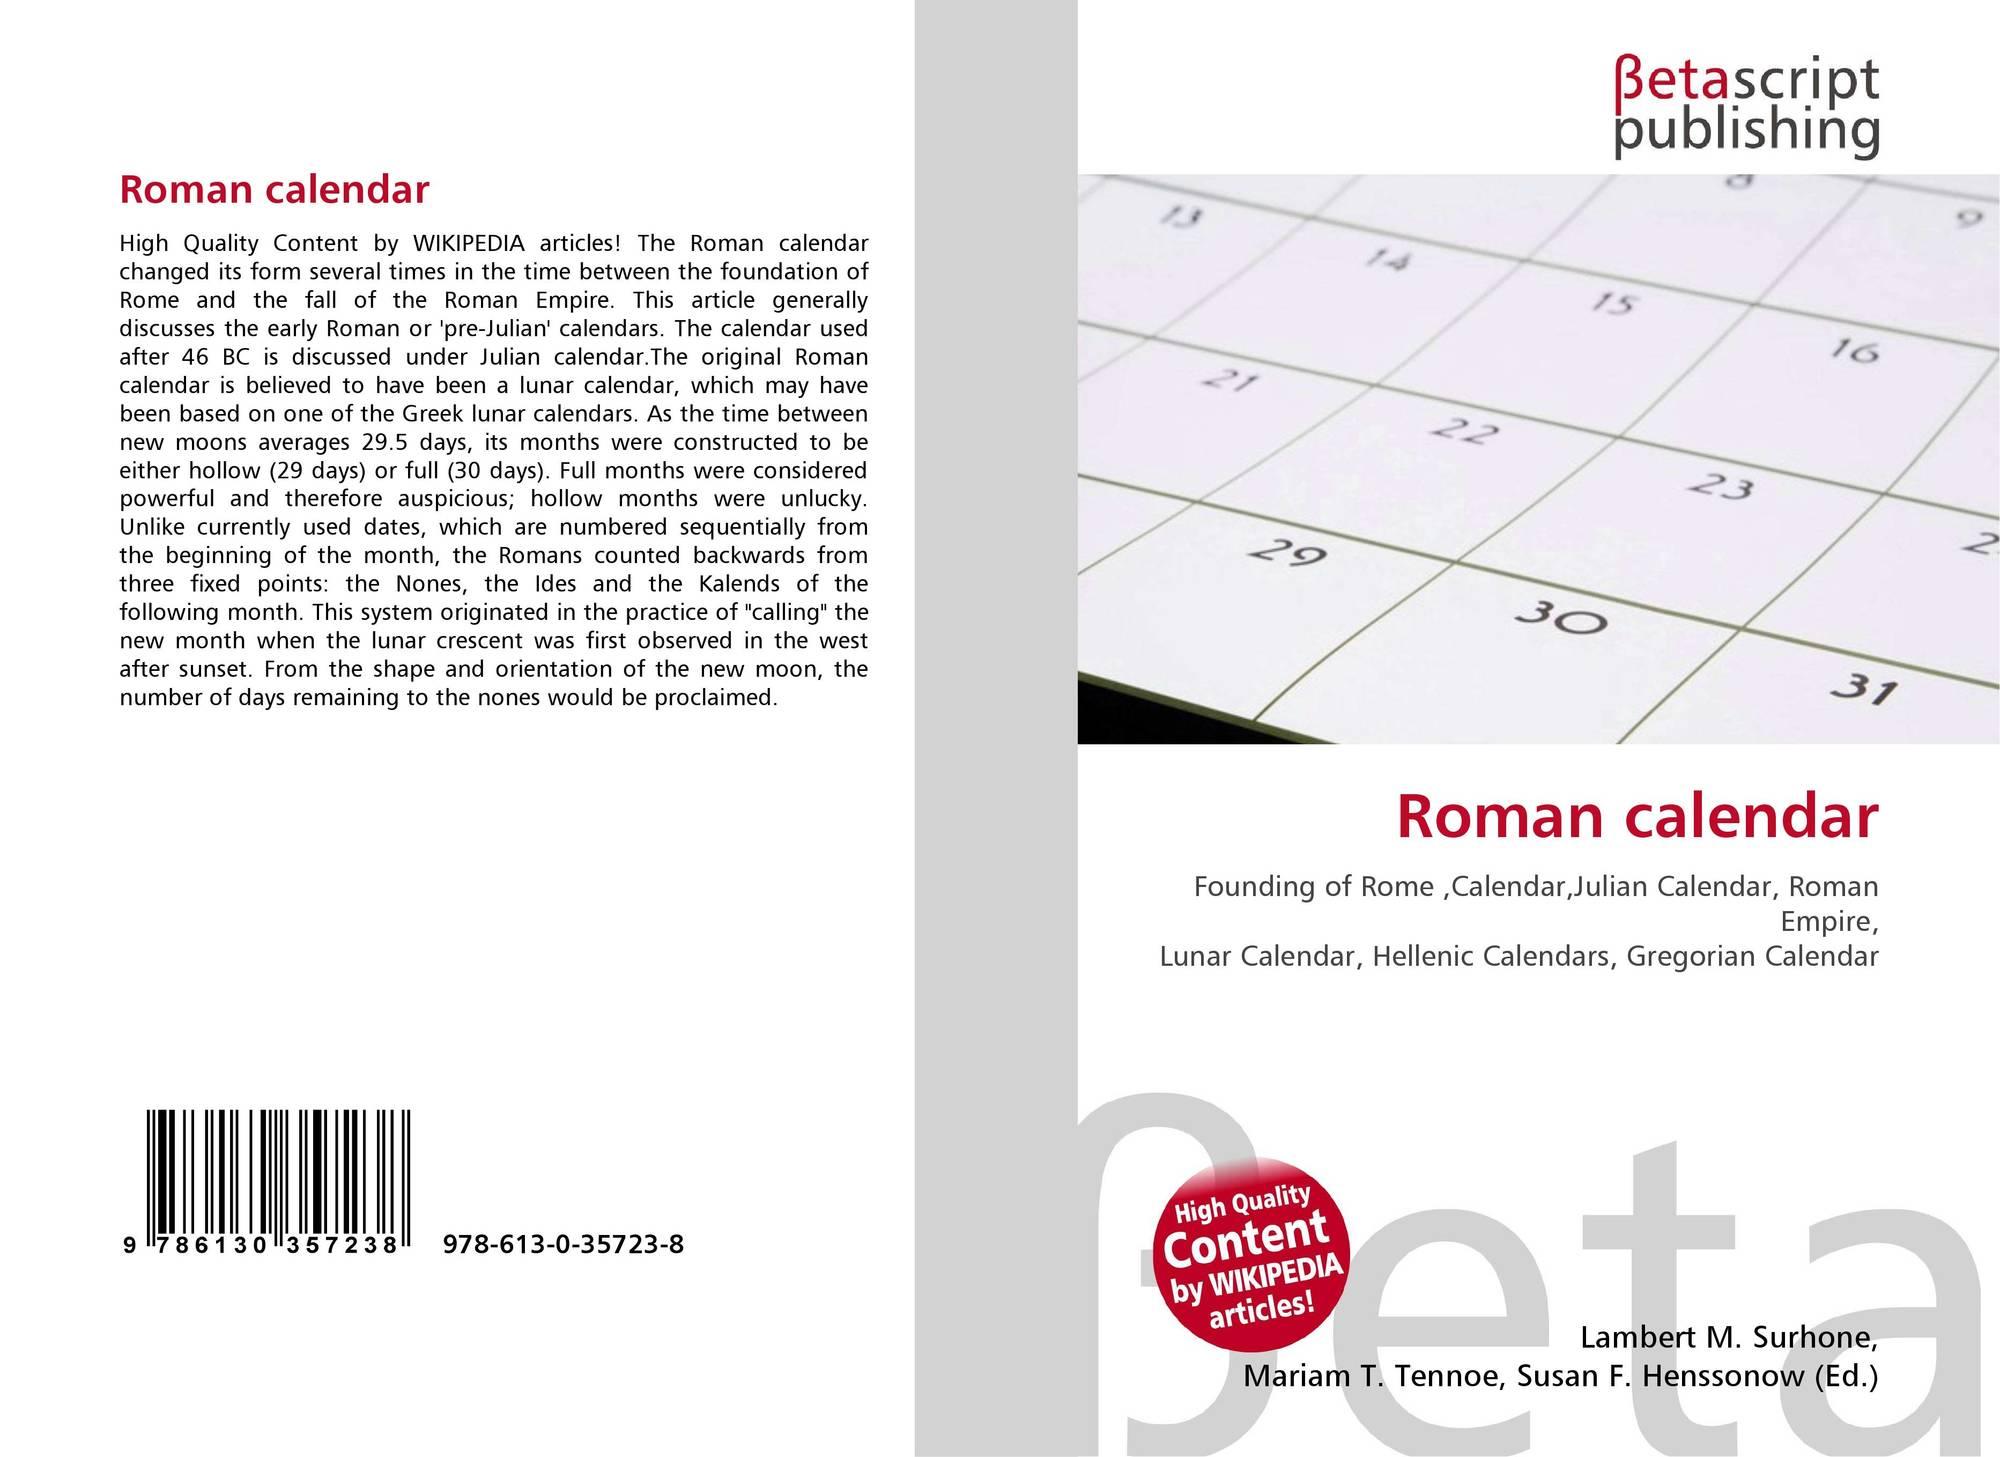 Roman Calendar.Roman Calendar 978 613 0 35723 8 6130357230 9786130357238